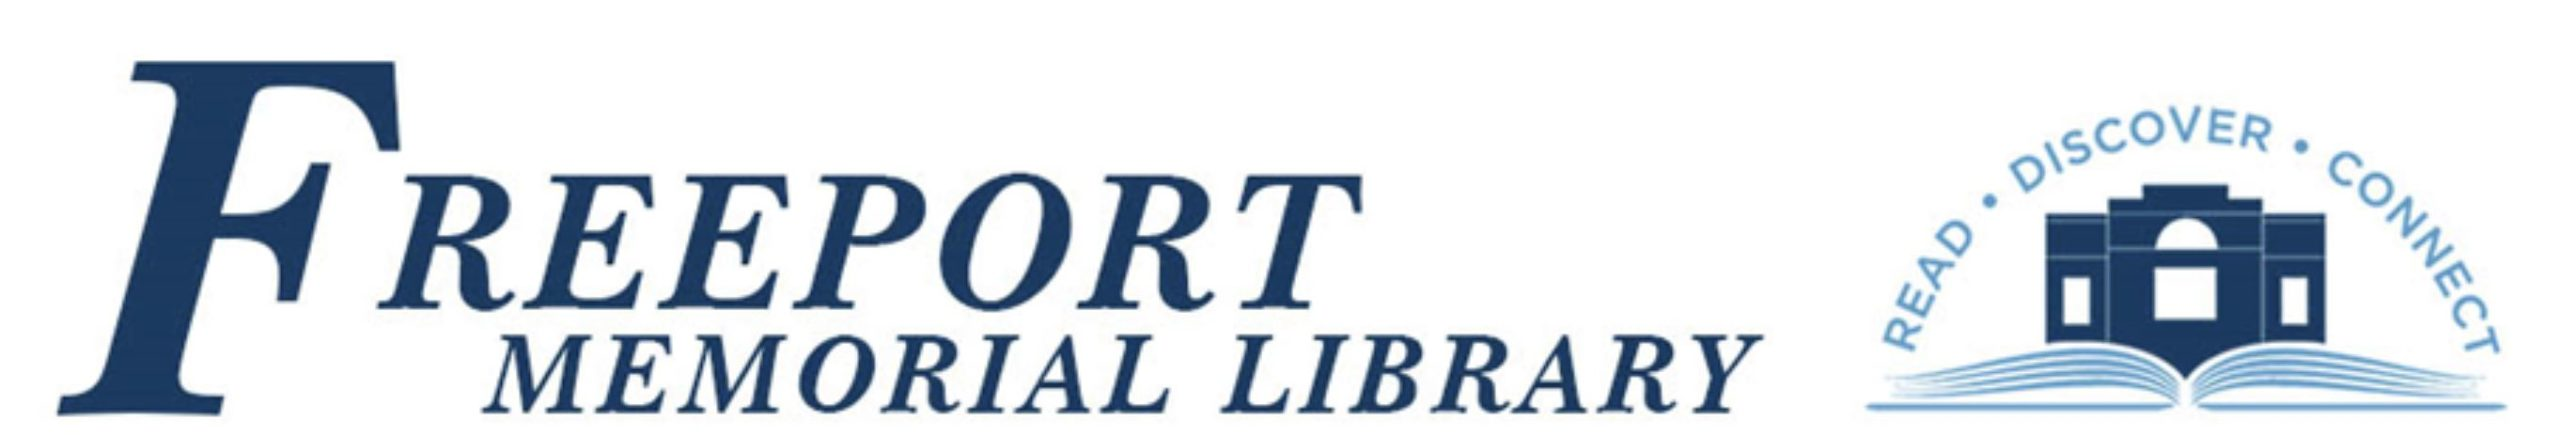 Freeport Memorial Public Library